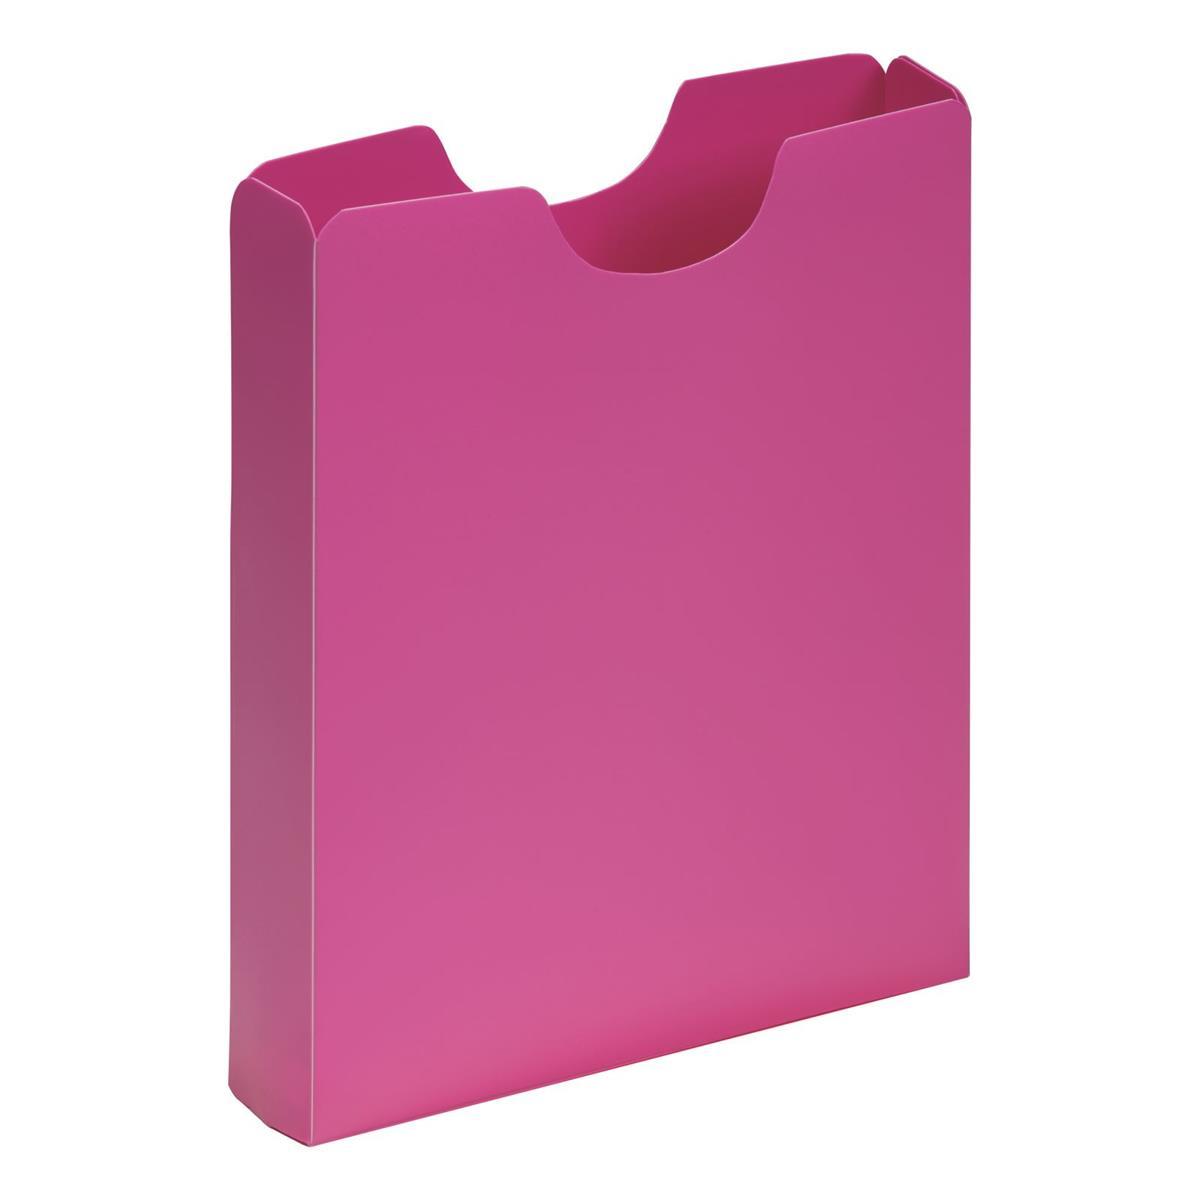 Pagna Carry Case Polypropylene A4 Dark Pink Ref 2100534 [Pack 10]